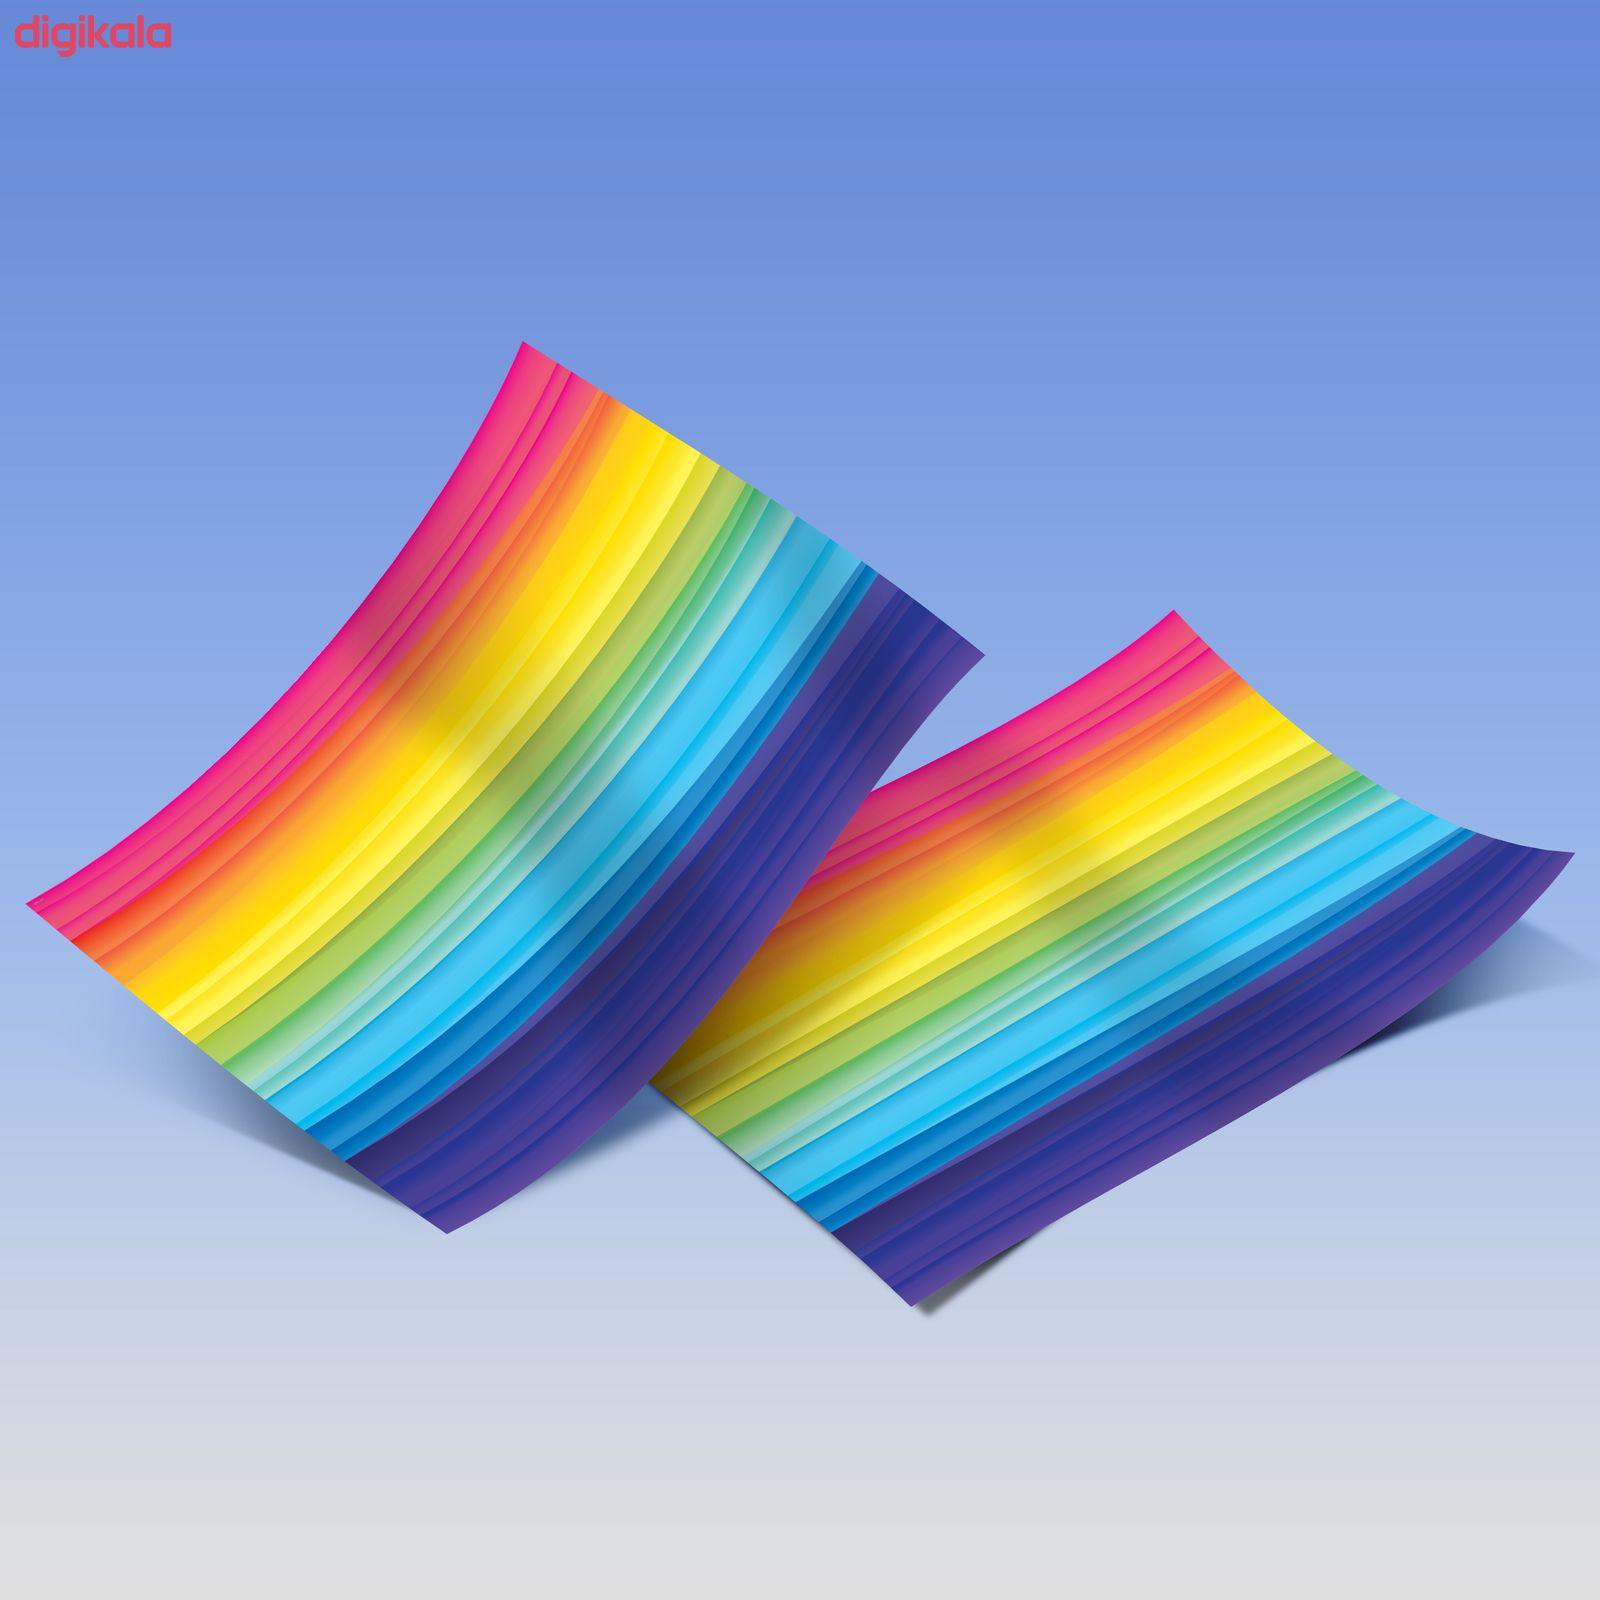 کاغذ رنگی A4 مستر راد مدل رنگارنگ بسته 10 عددی main 1 13